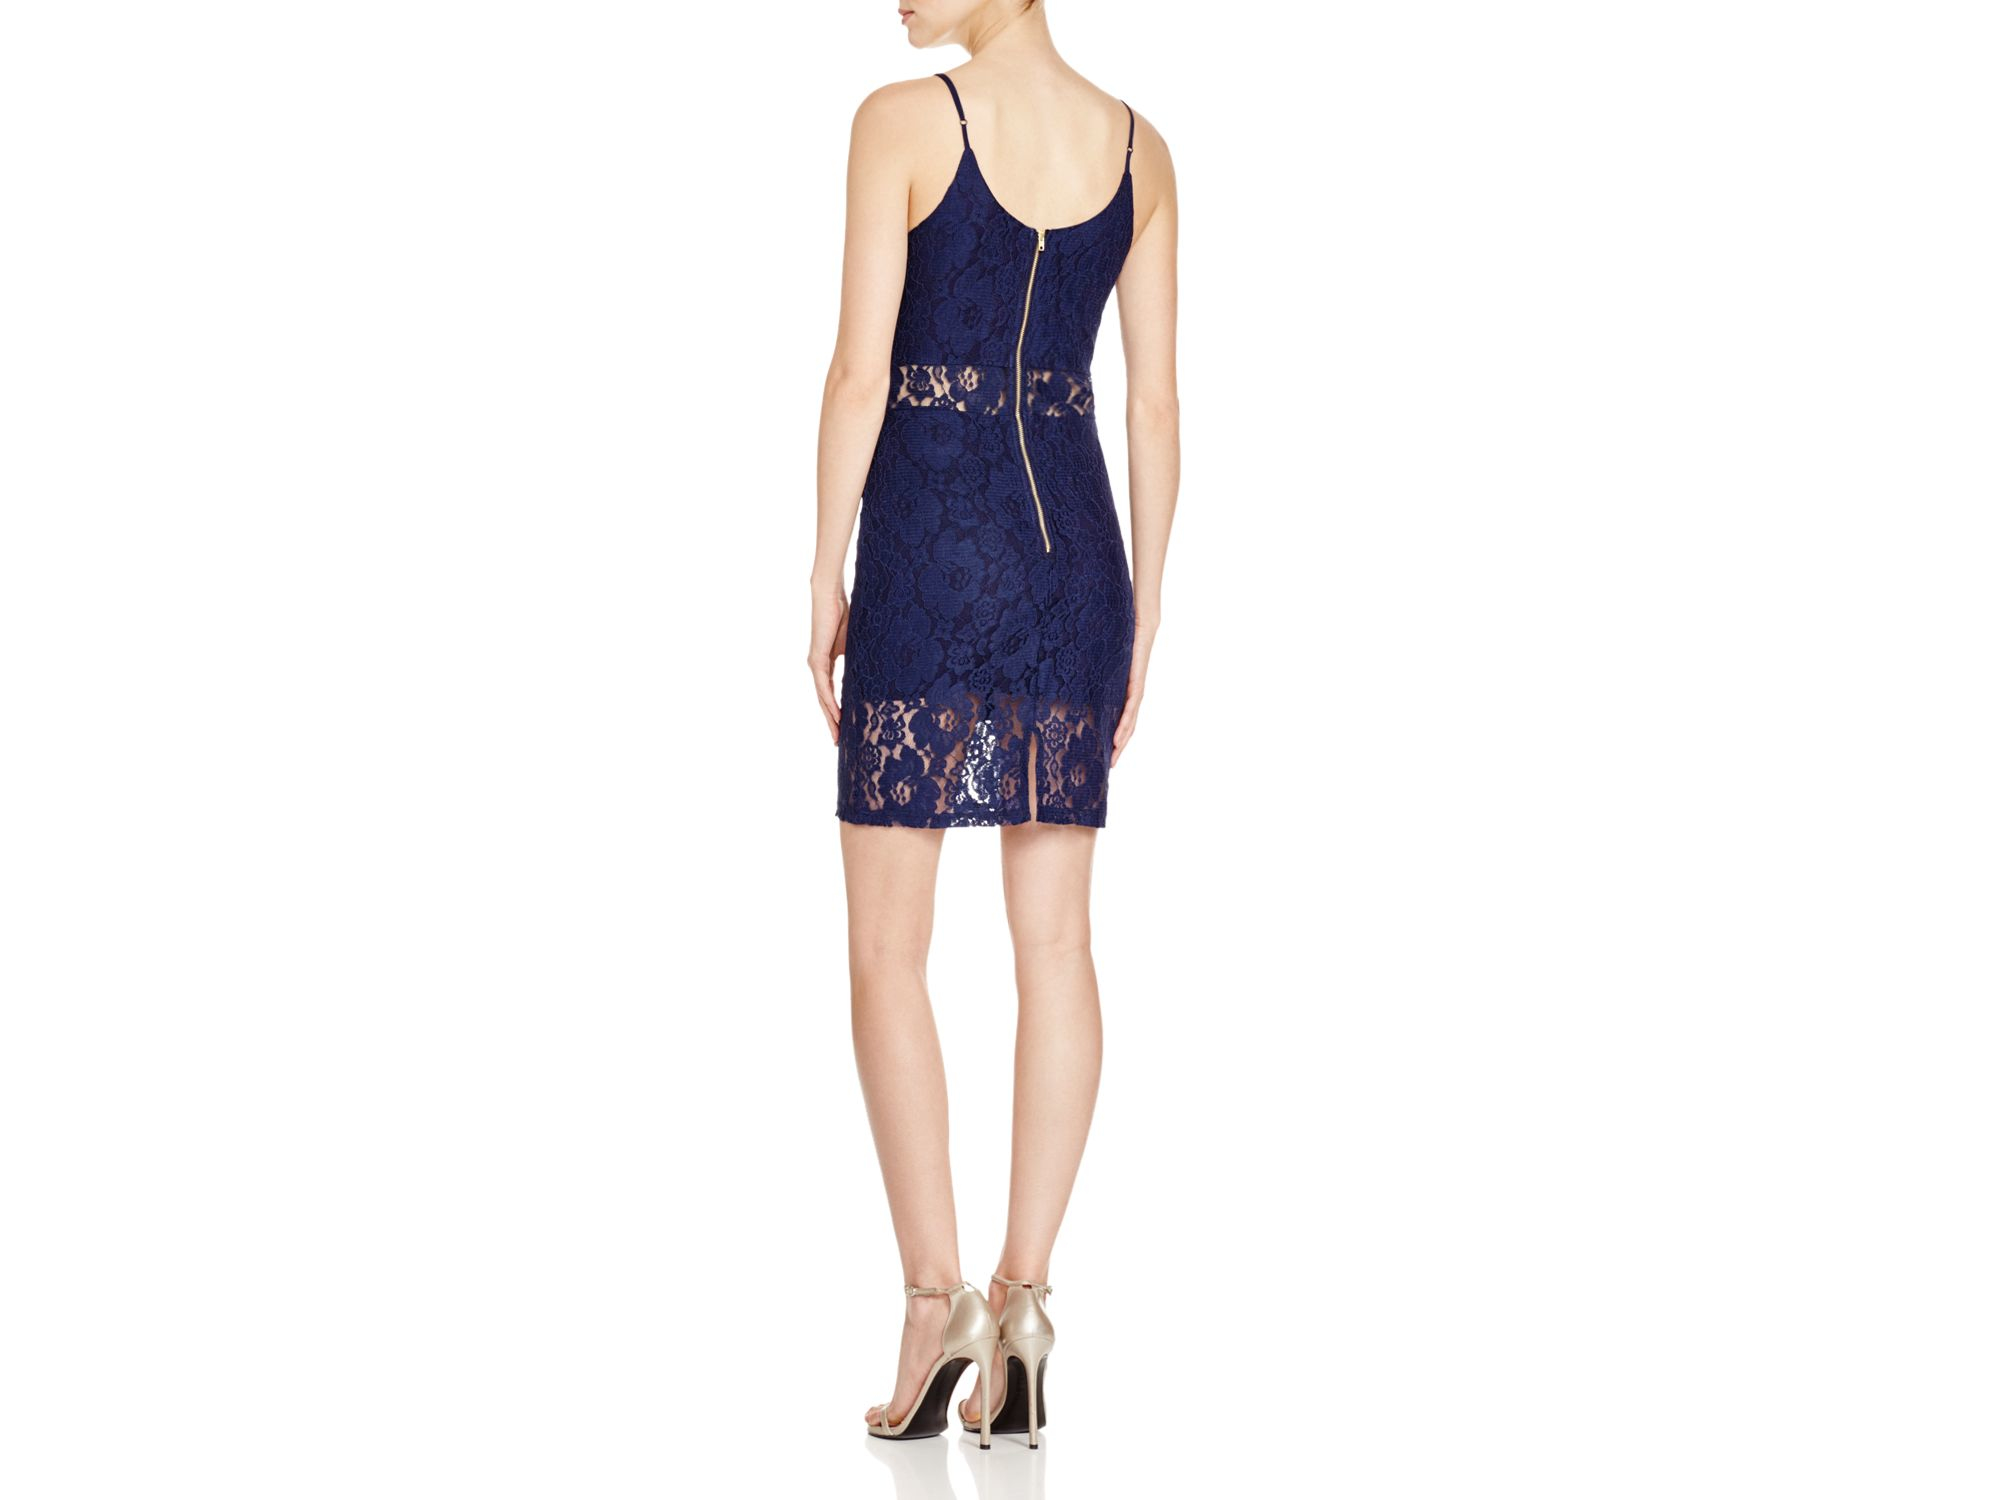 Watch - Blue aqua lace dress video